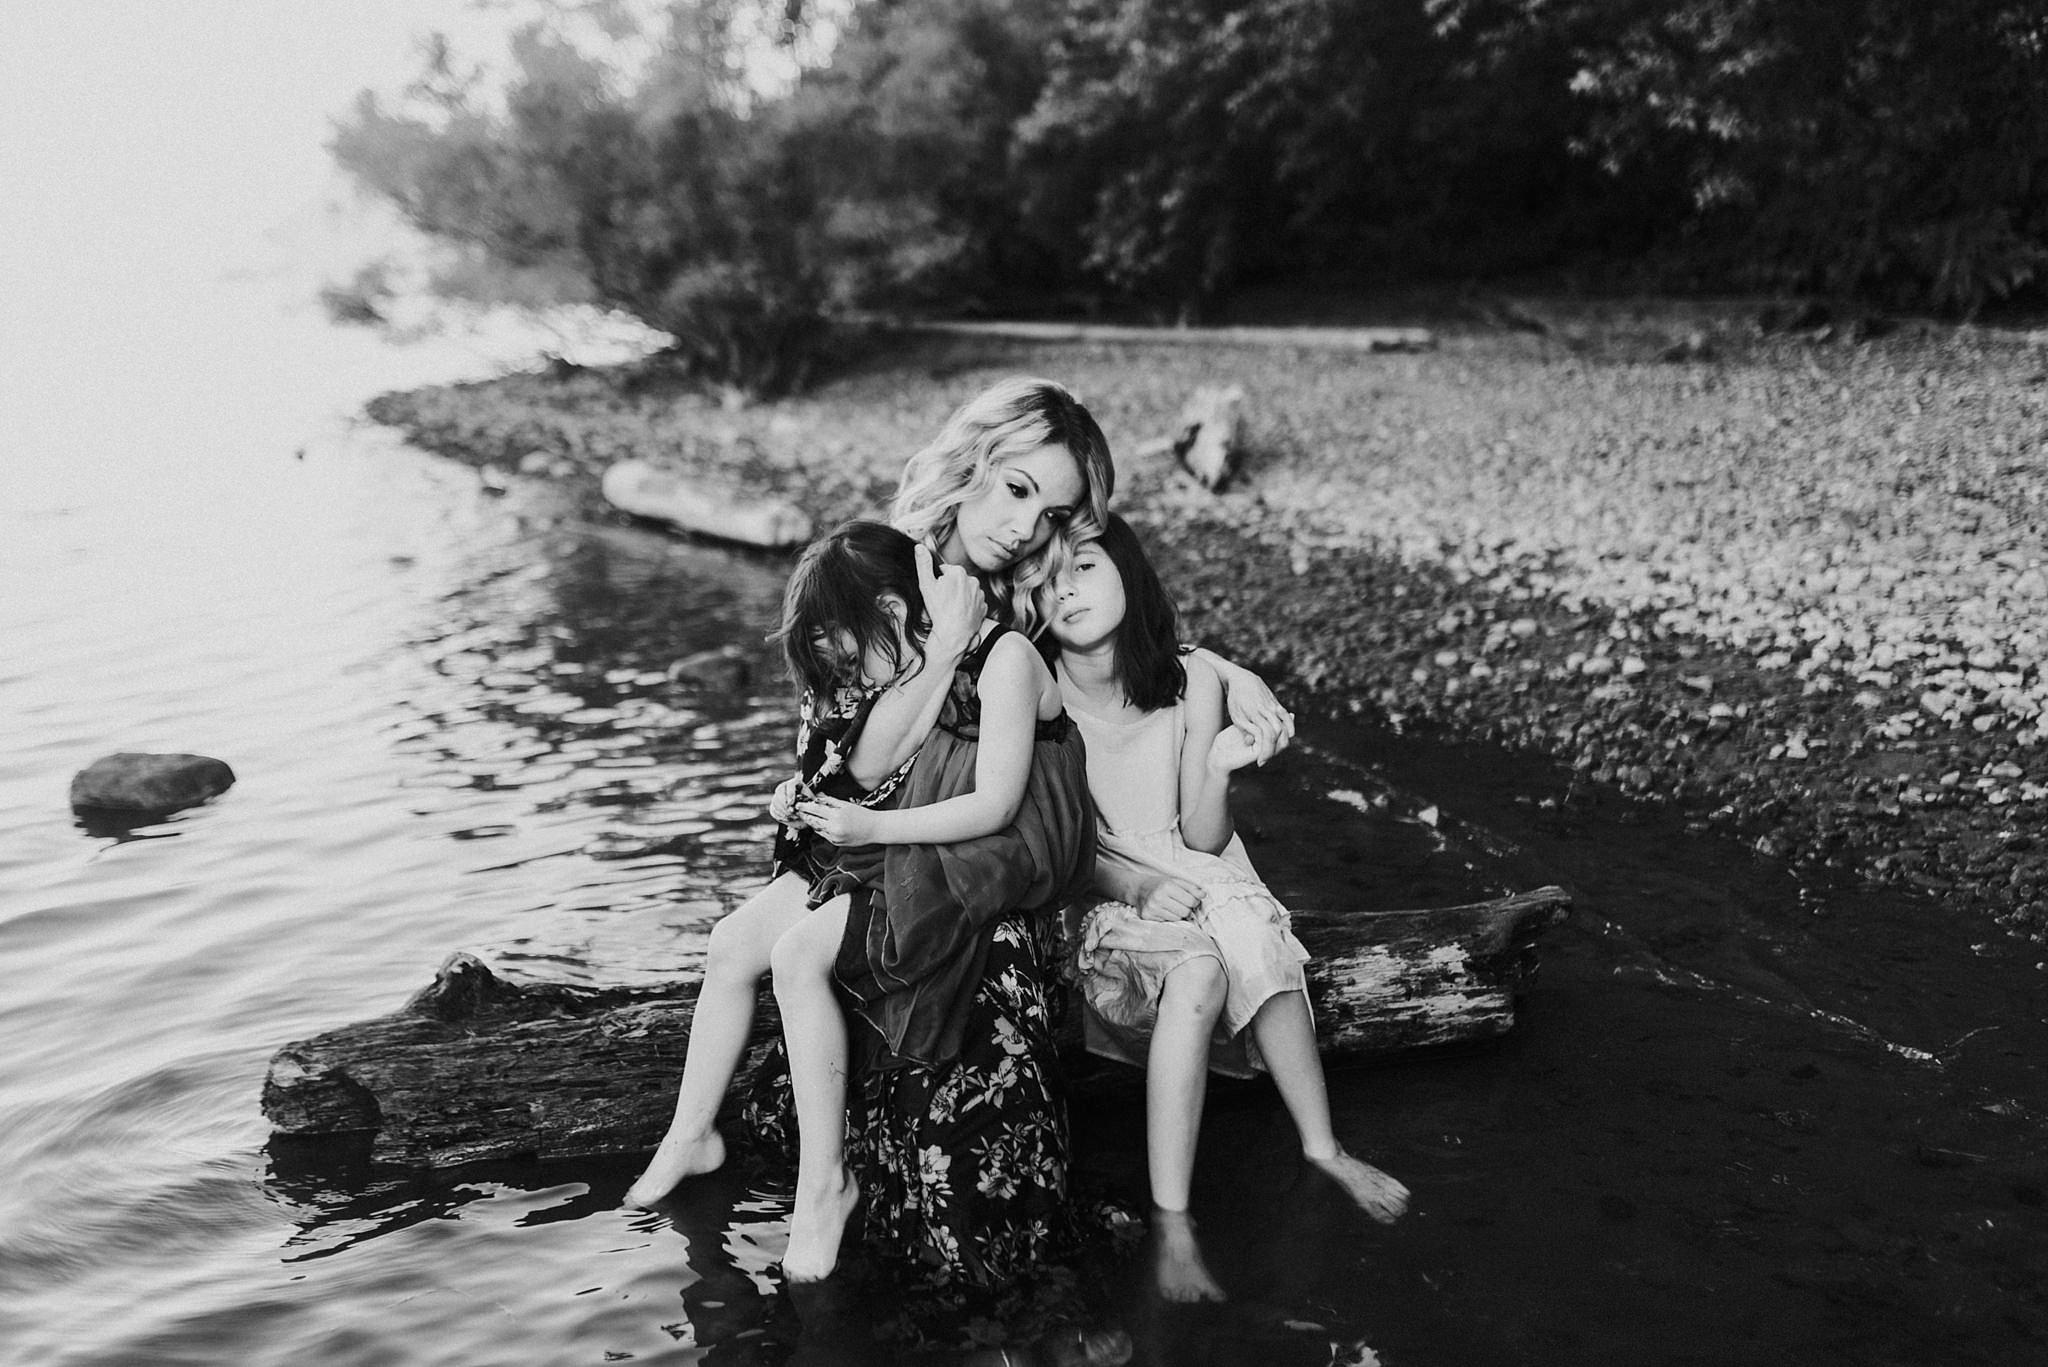 twyla jones photography - treasure coast florida - intimate couples session urban cowboy b&b | brooklyn New York_0081.jpg